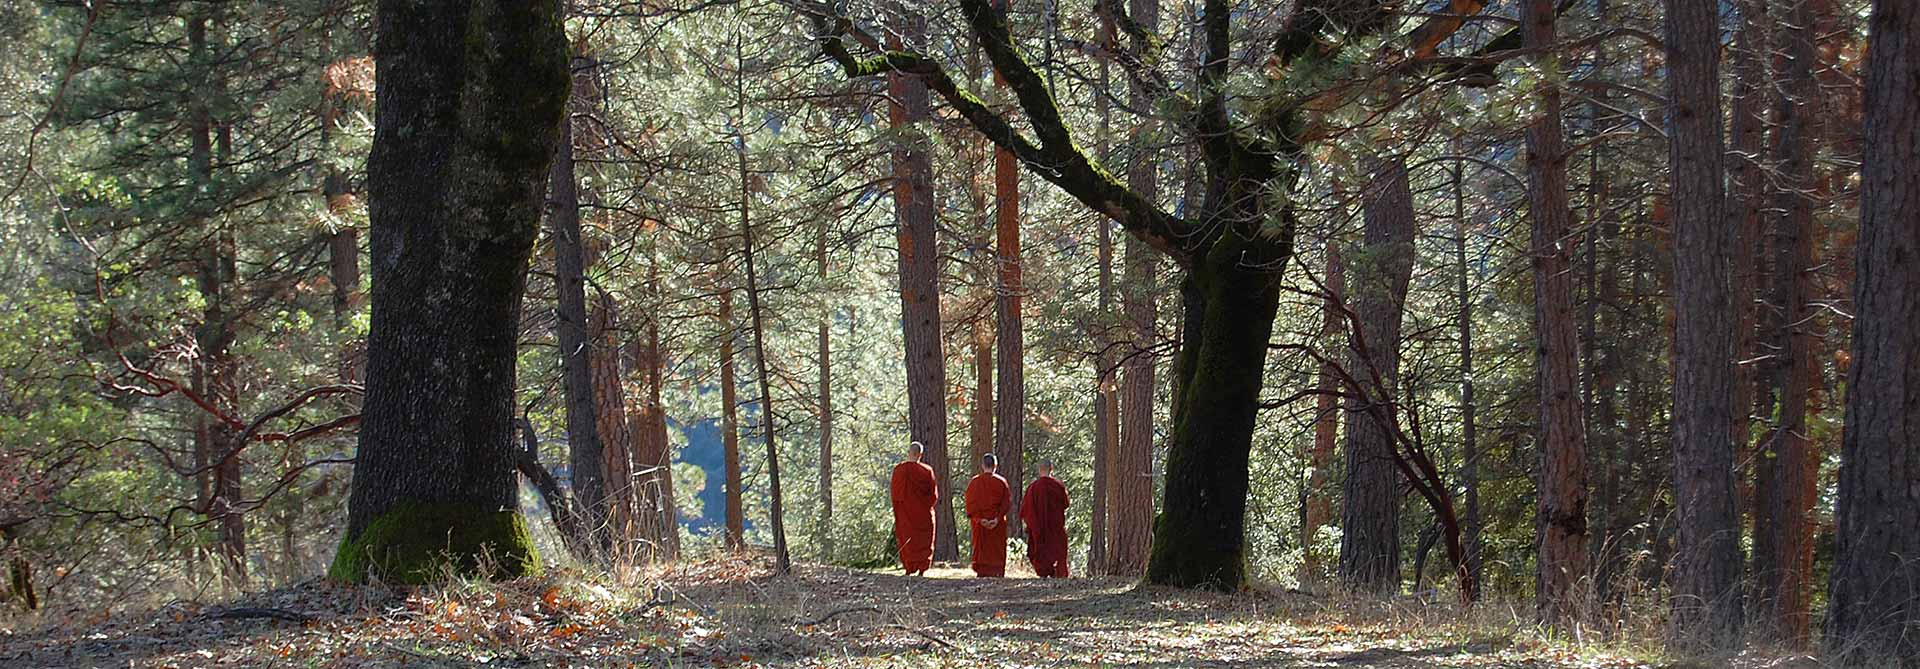 Aloka Vihara Forest Monastery-nuns walking together